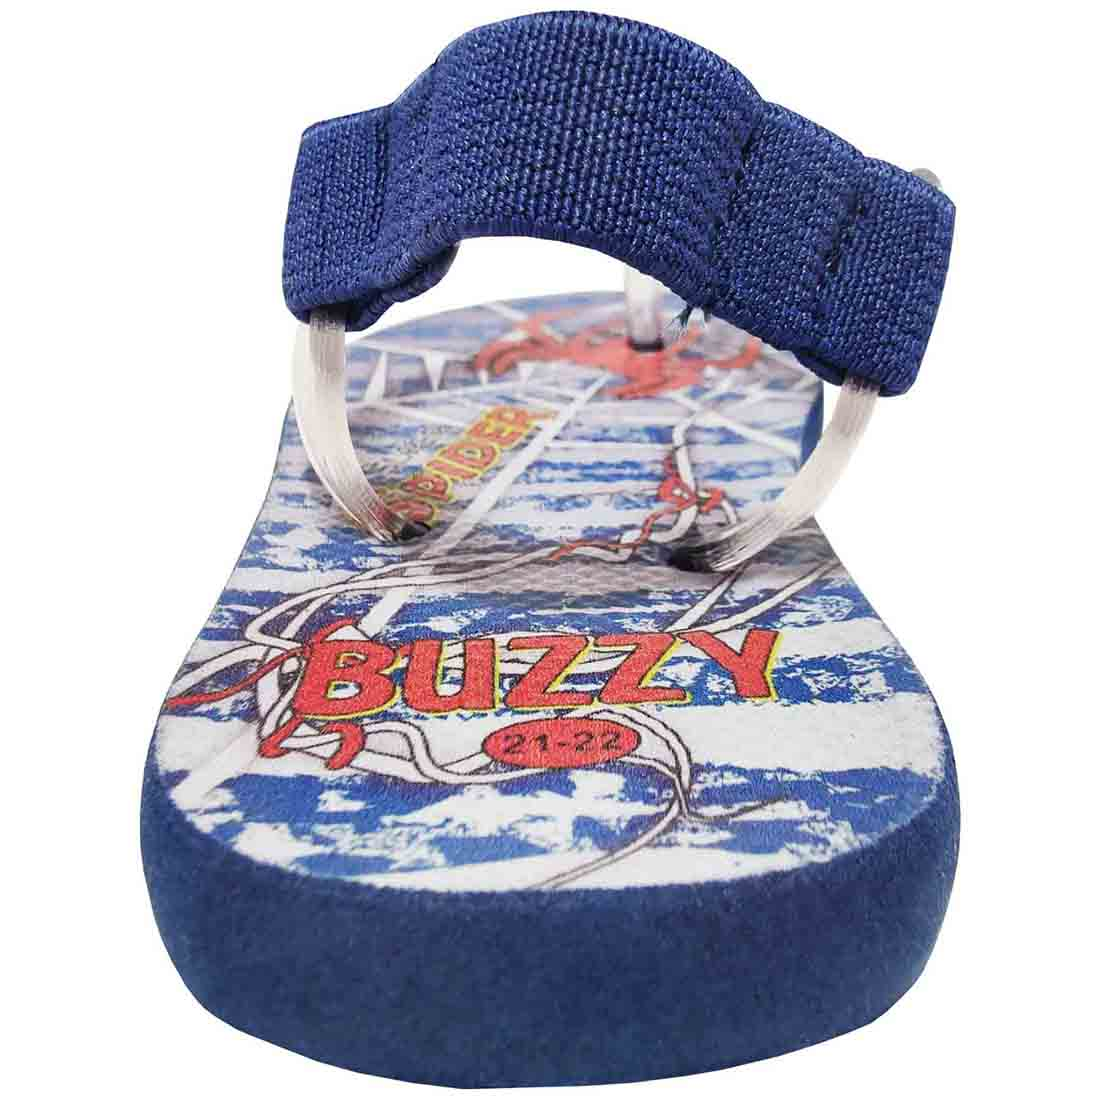 Chinelo  Bebê Buzzy Sandália Infantil Aranha Meninos BZ006